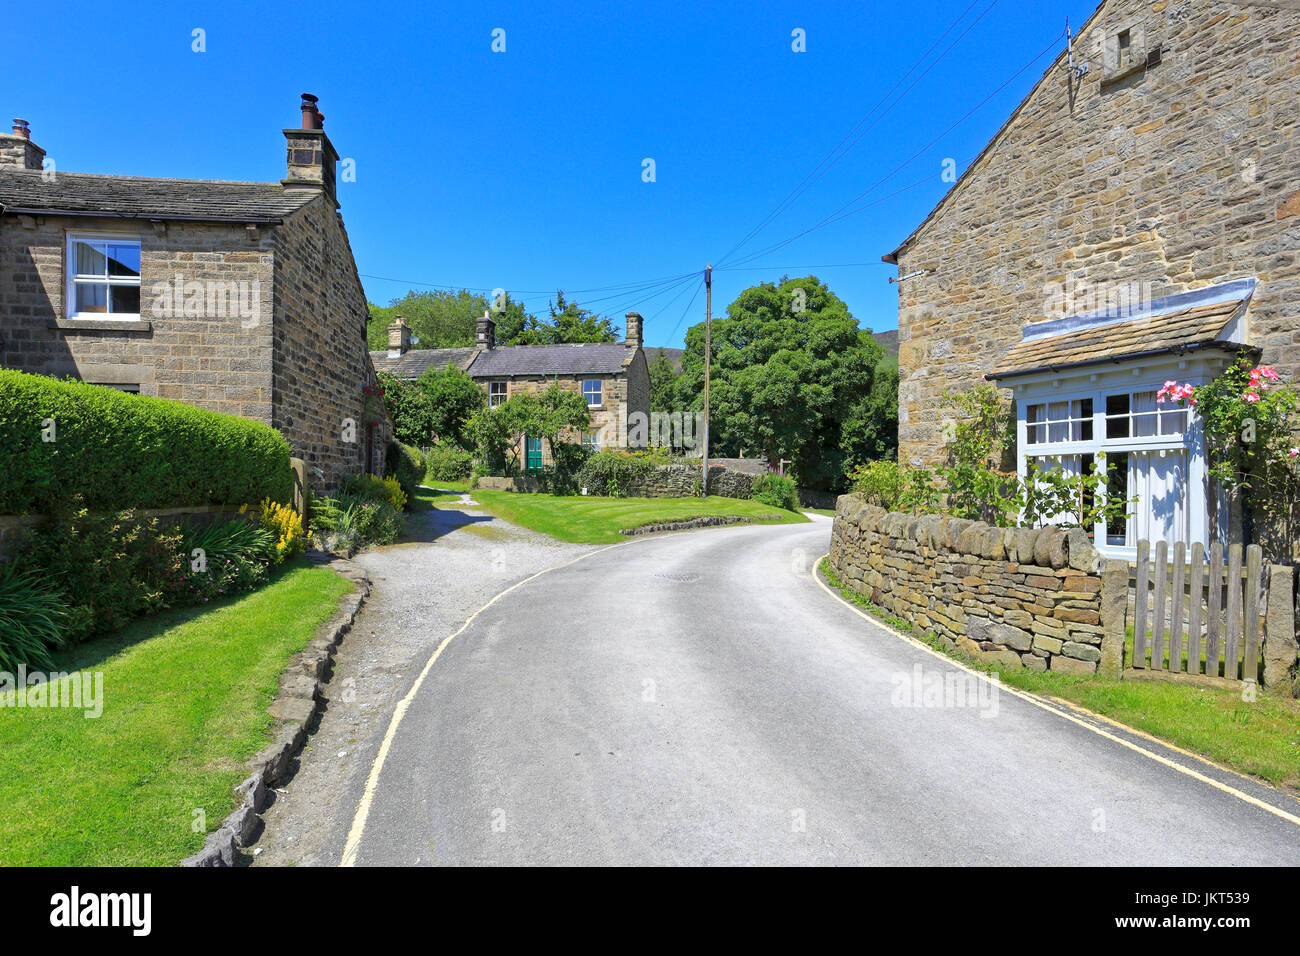 Edale, the start of the Pennine Way, Derbyshire, Peak District National Park, England, UK. - Stock Image